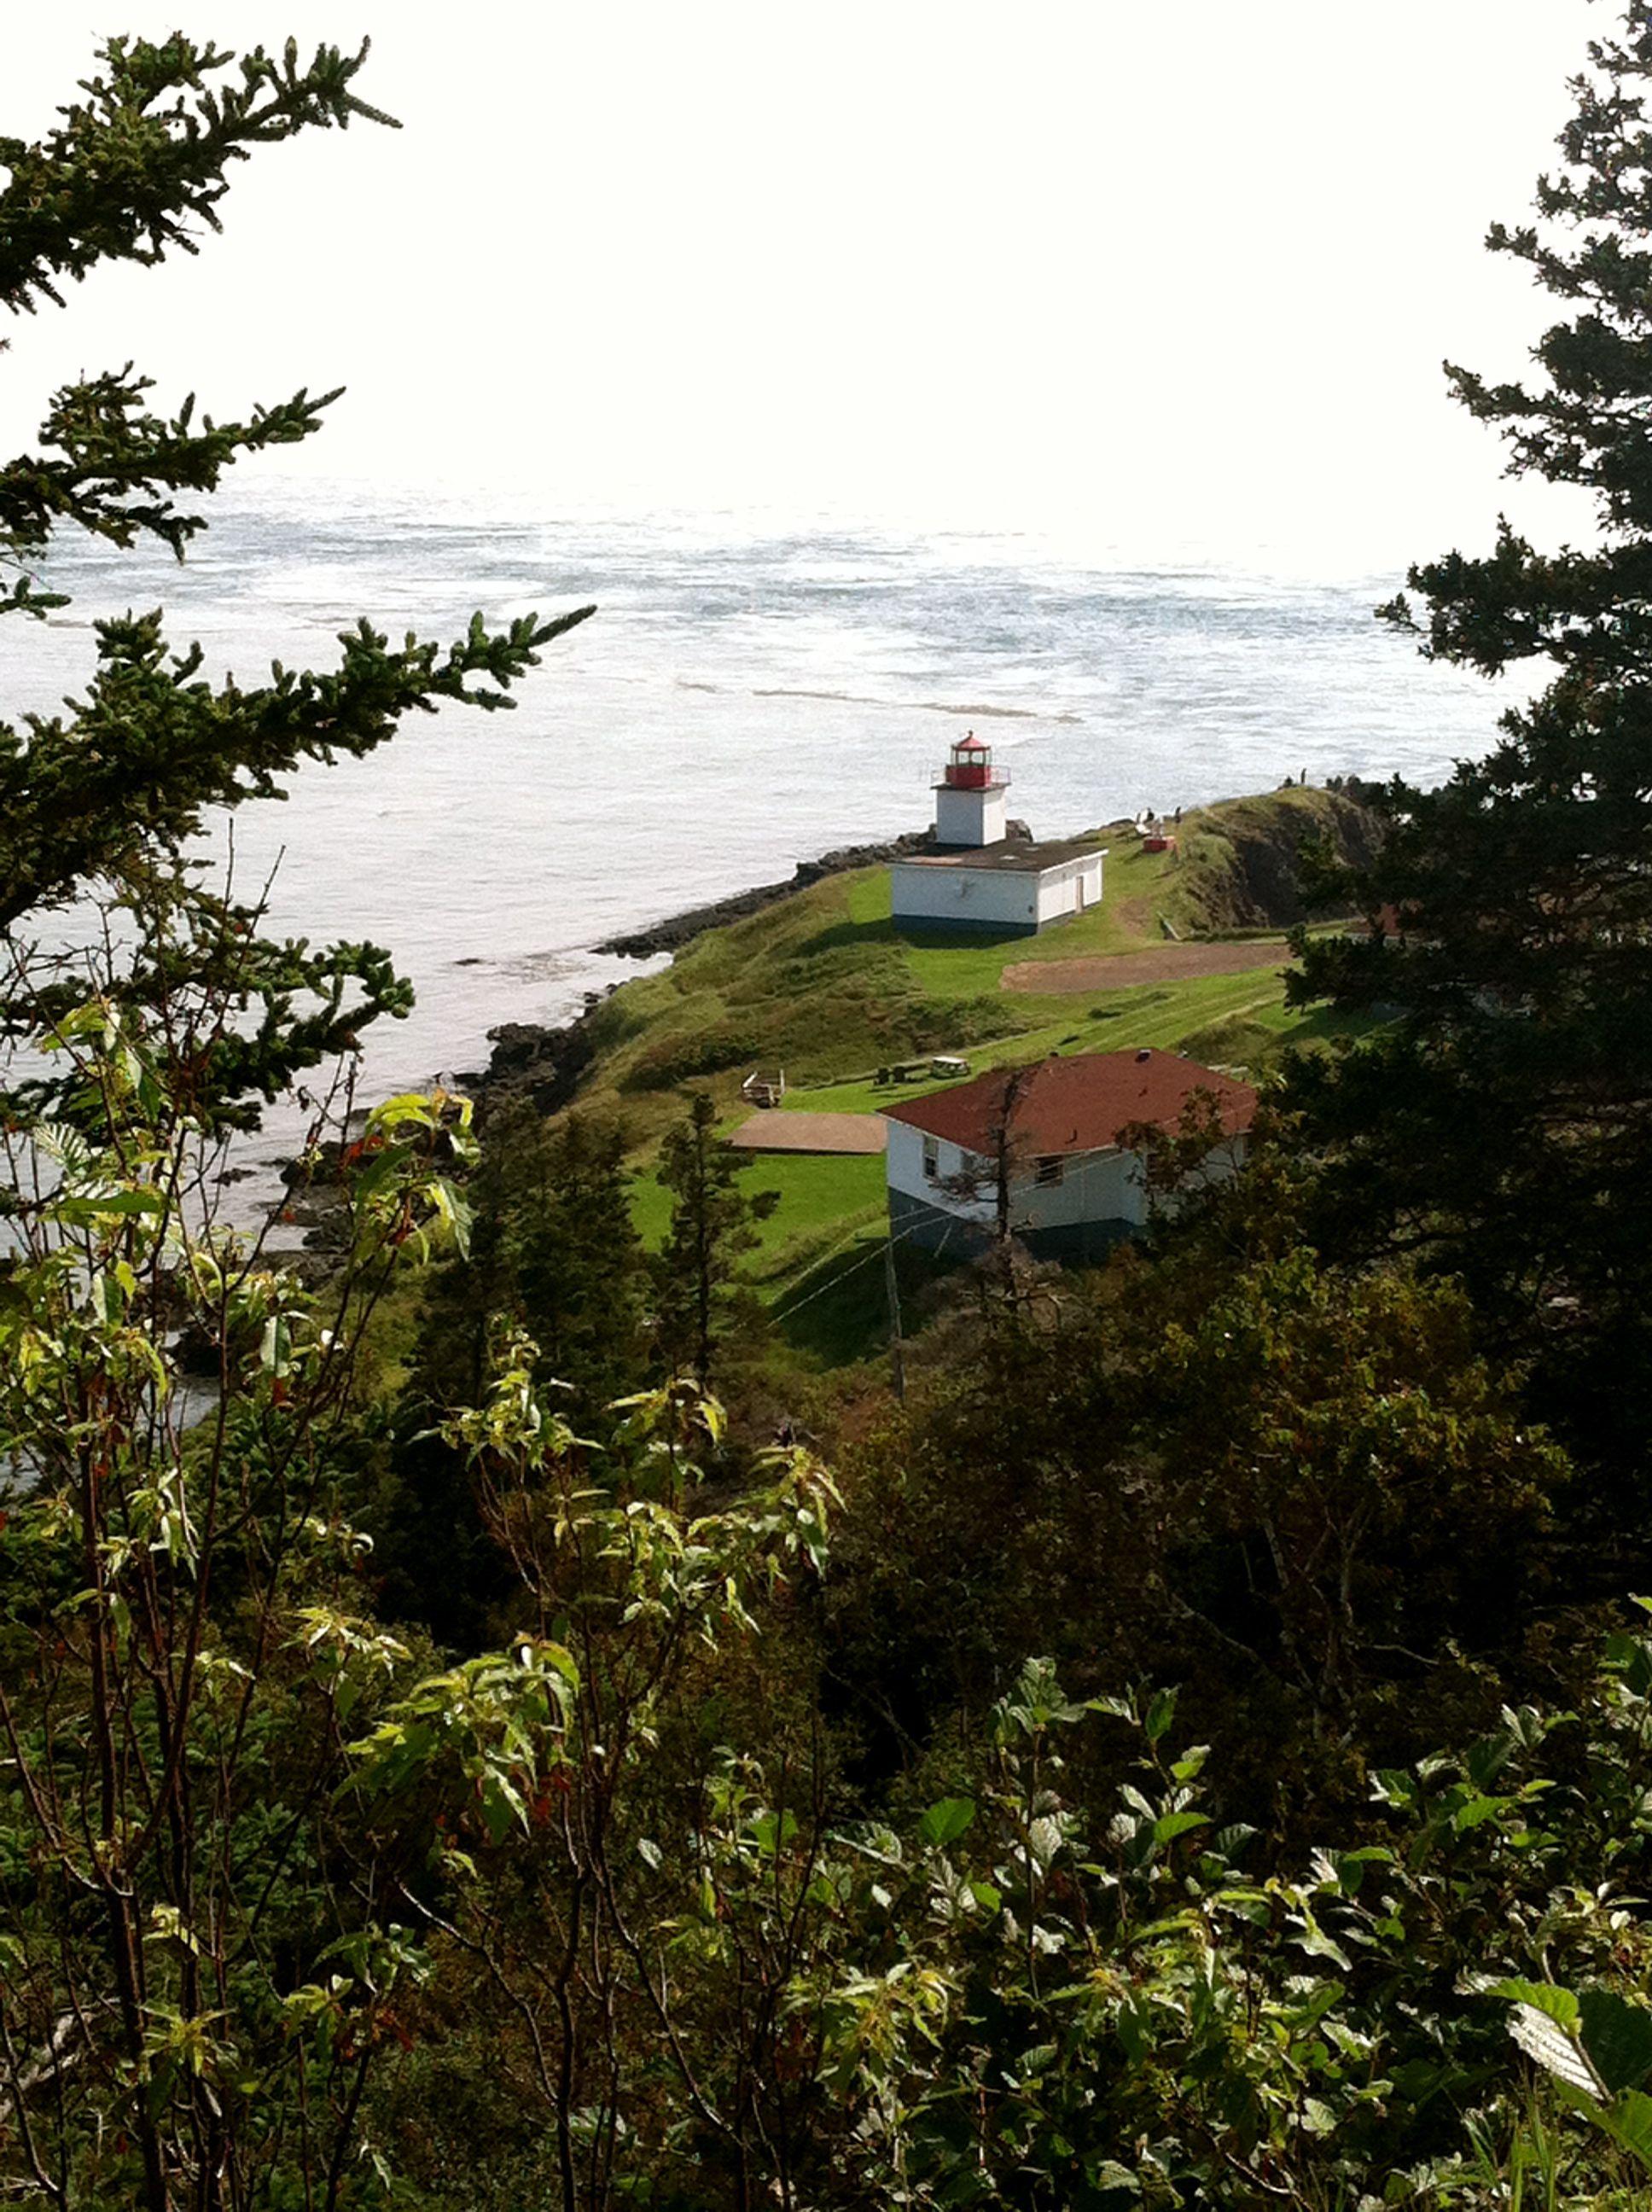 Lighthouse at Cape d'Or, Nova Scotia, Canada